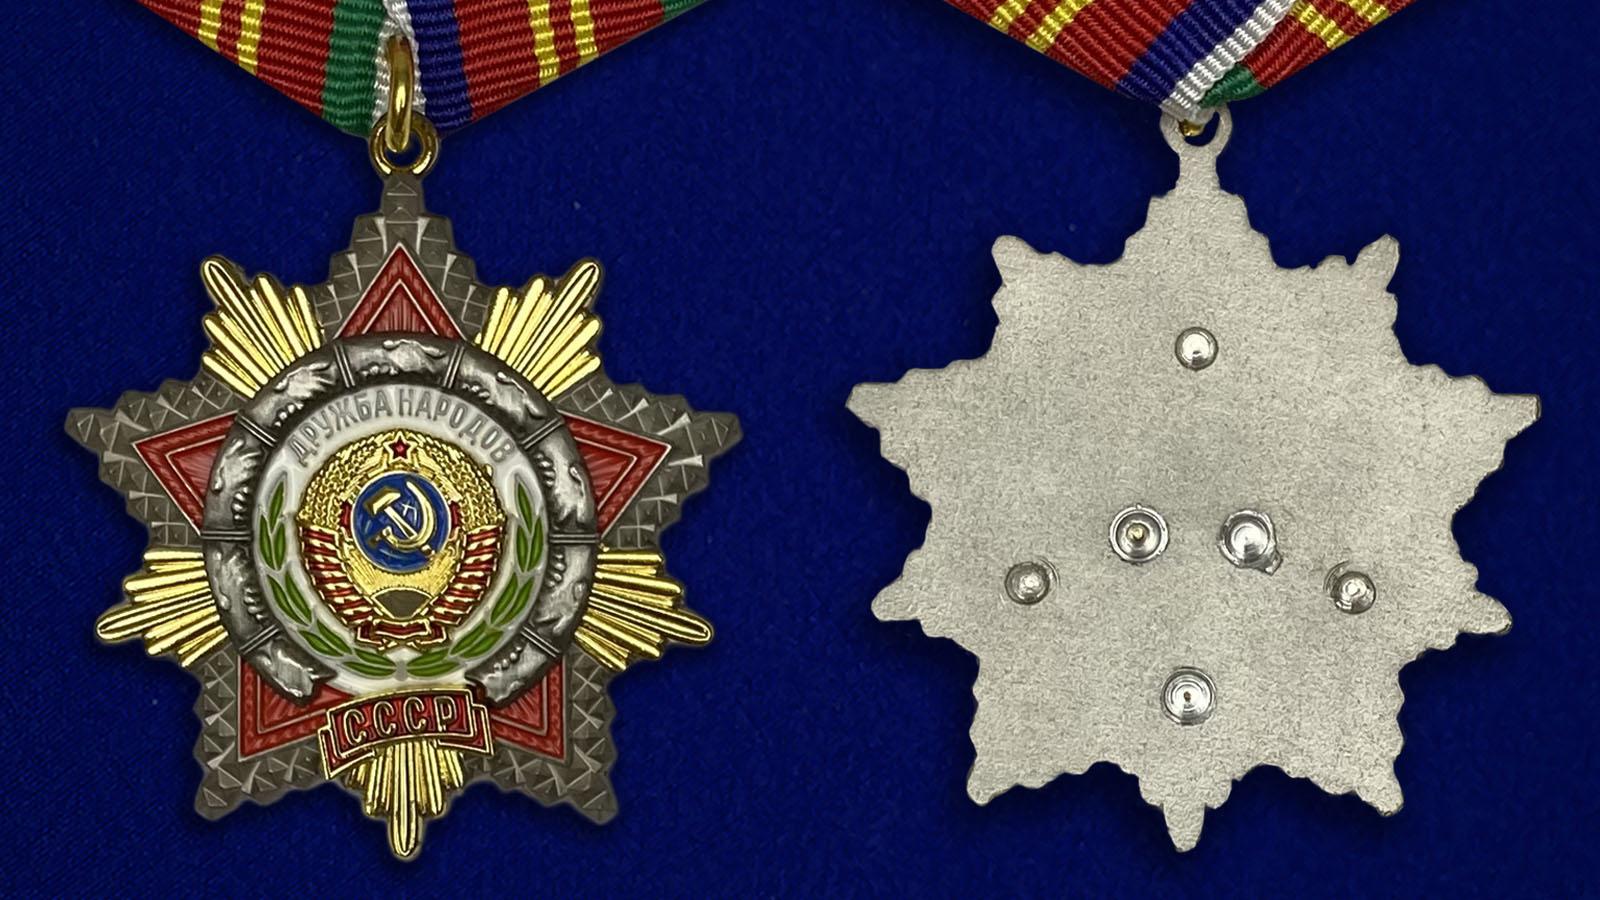 Орден Дружбы народов СССР - аверс и реверс